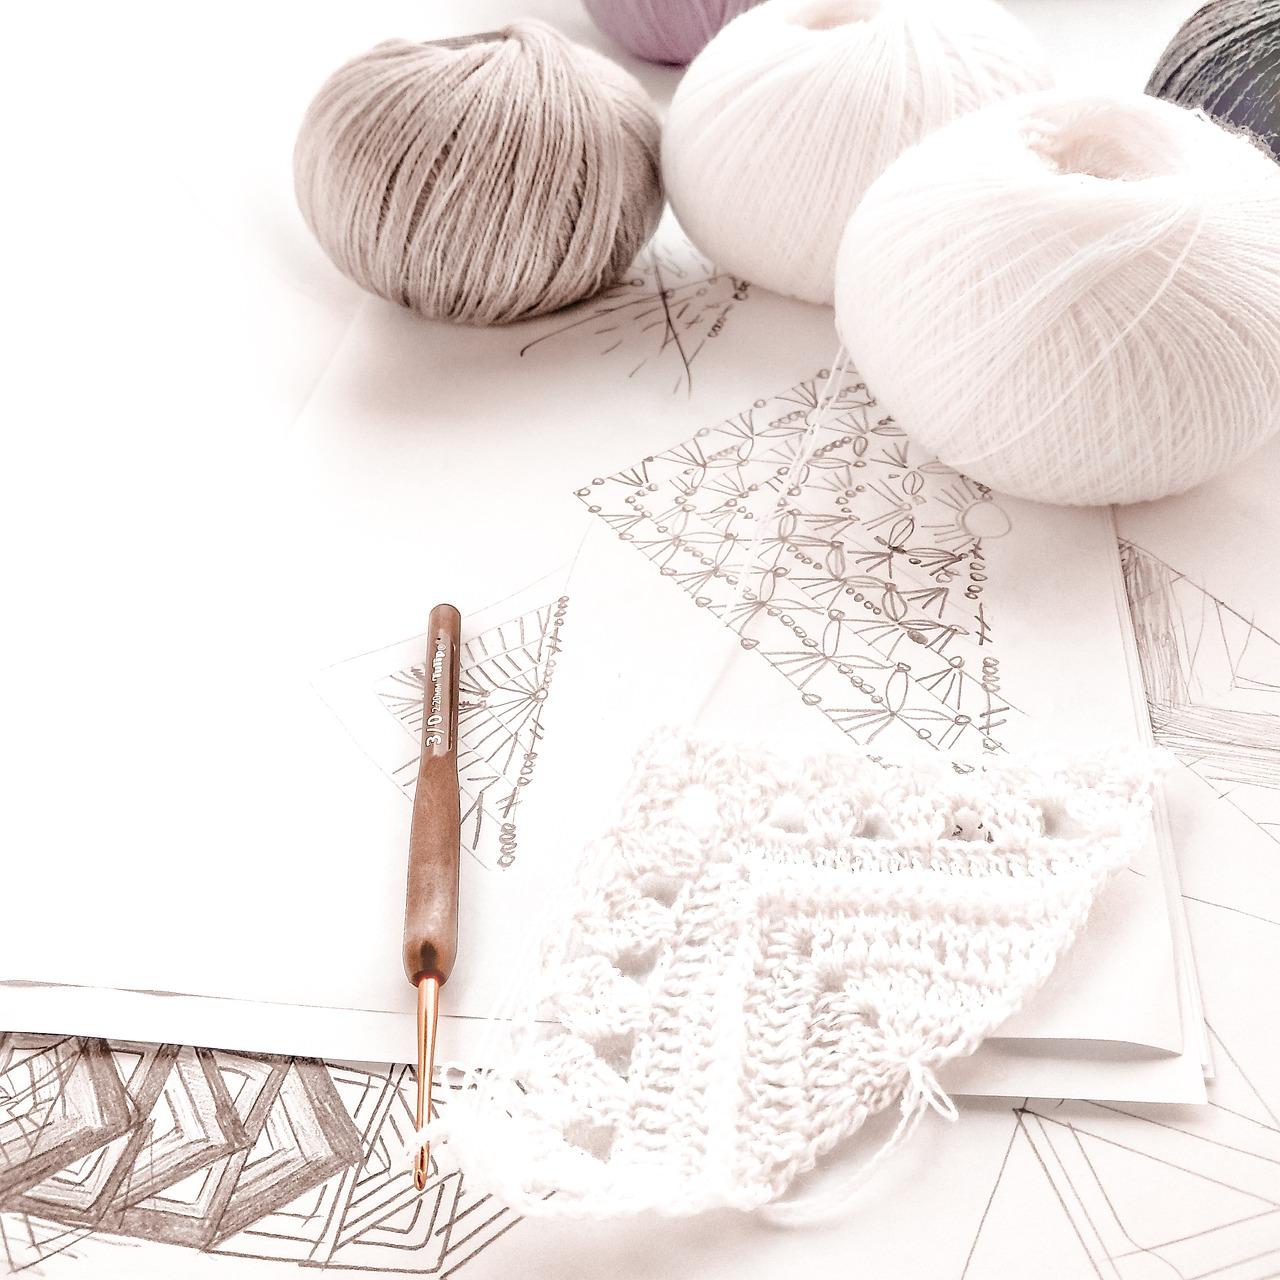 White yarn and knitting needles.